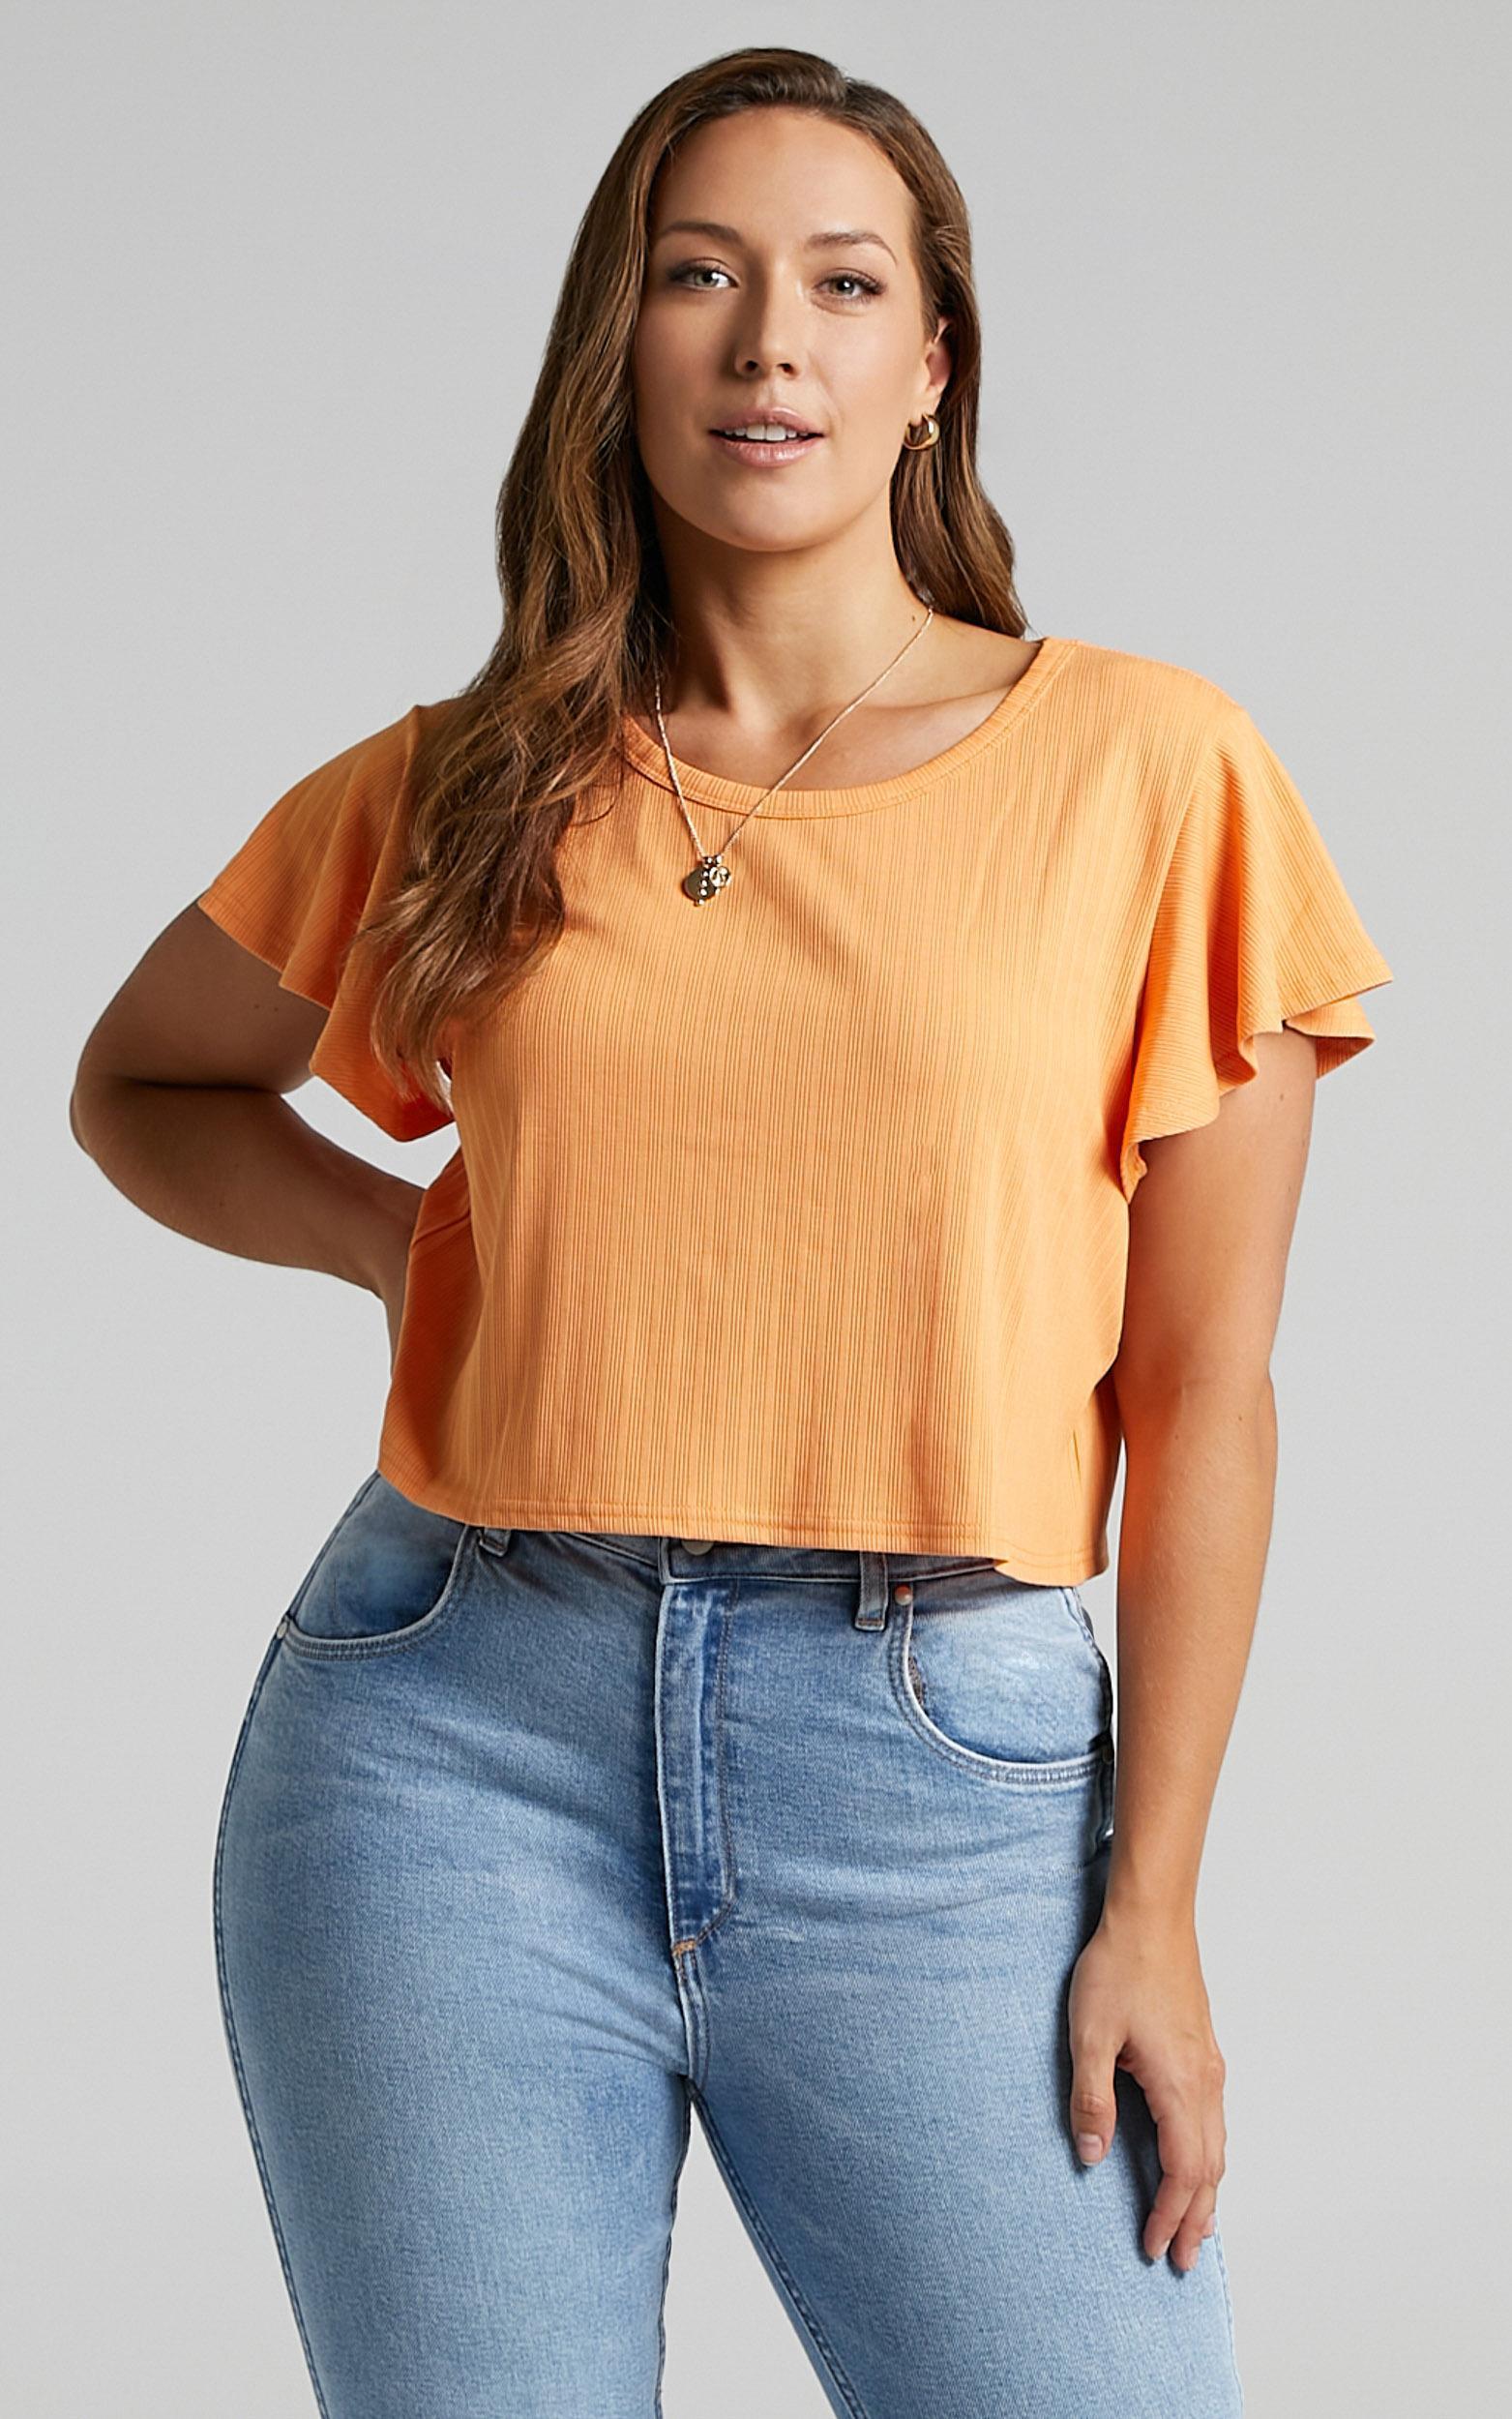 Broome Top in Sherbet - 6 (XS), Orange, hi-res image number null